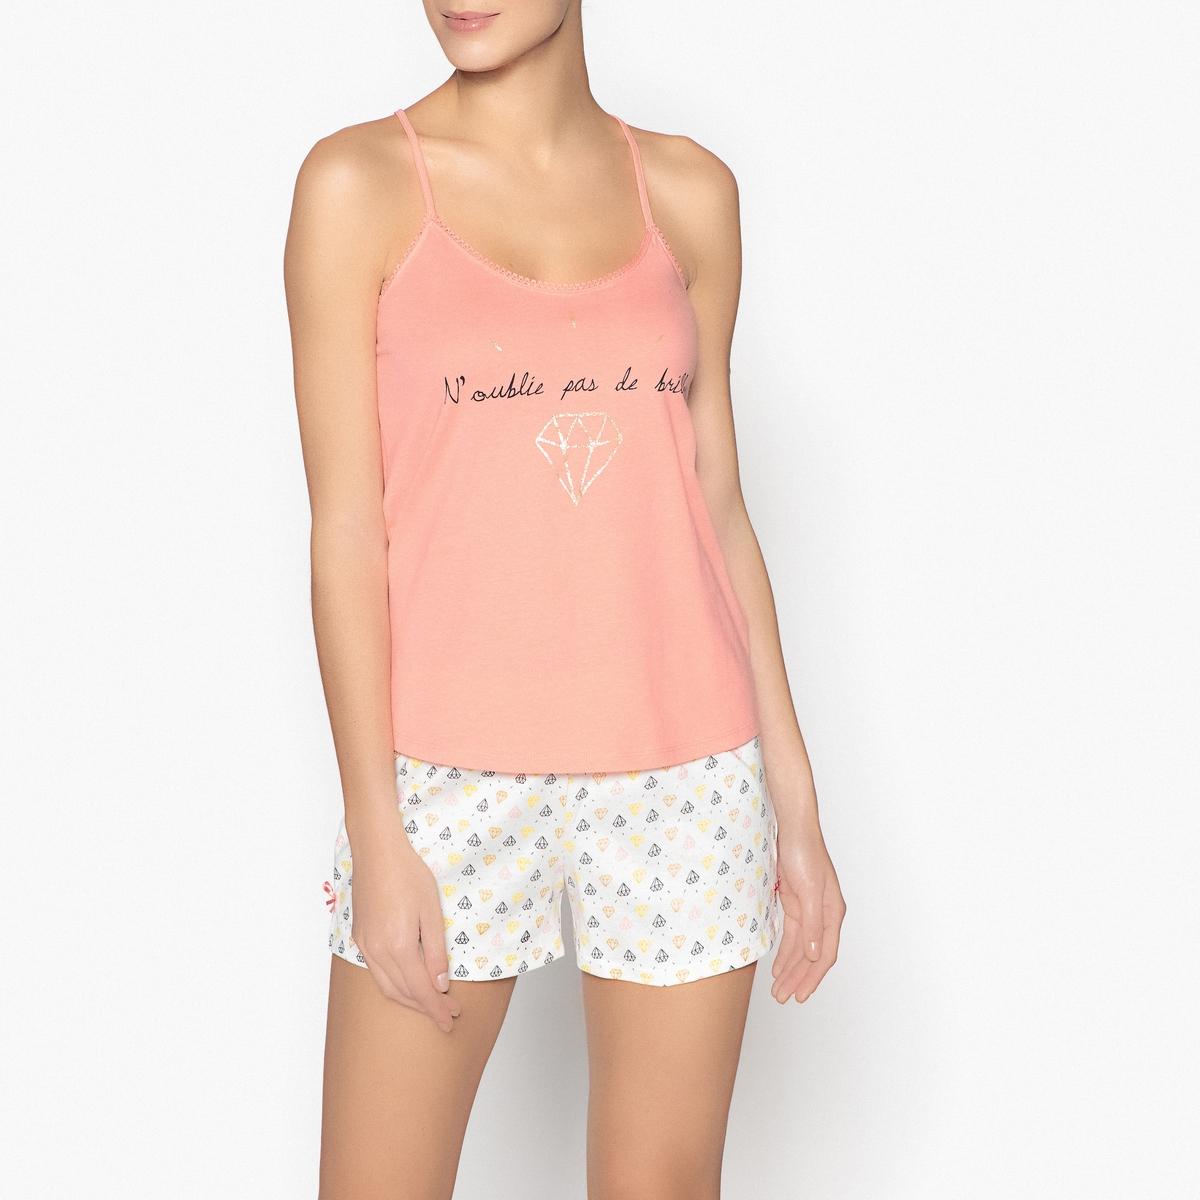 Пижама с шортами с надписью из блесток пижама с шортами quelle le jogger 193555